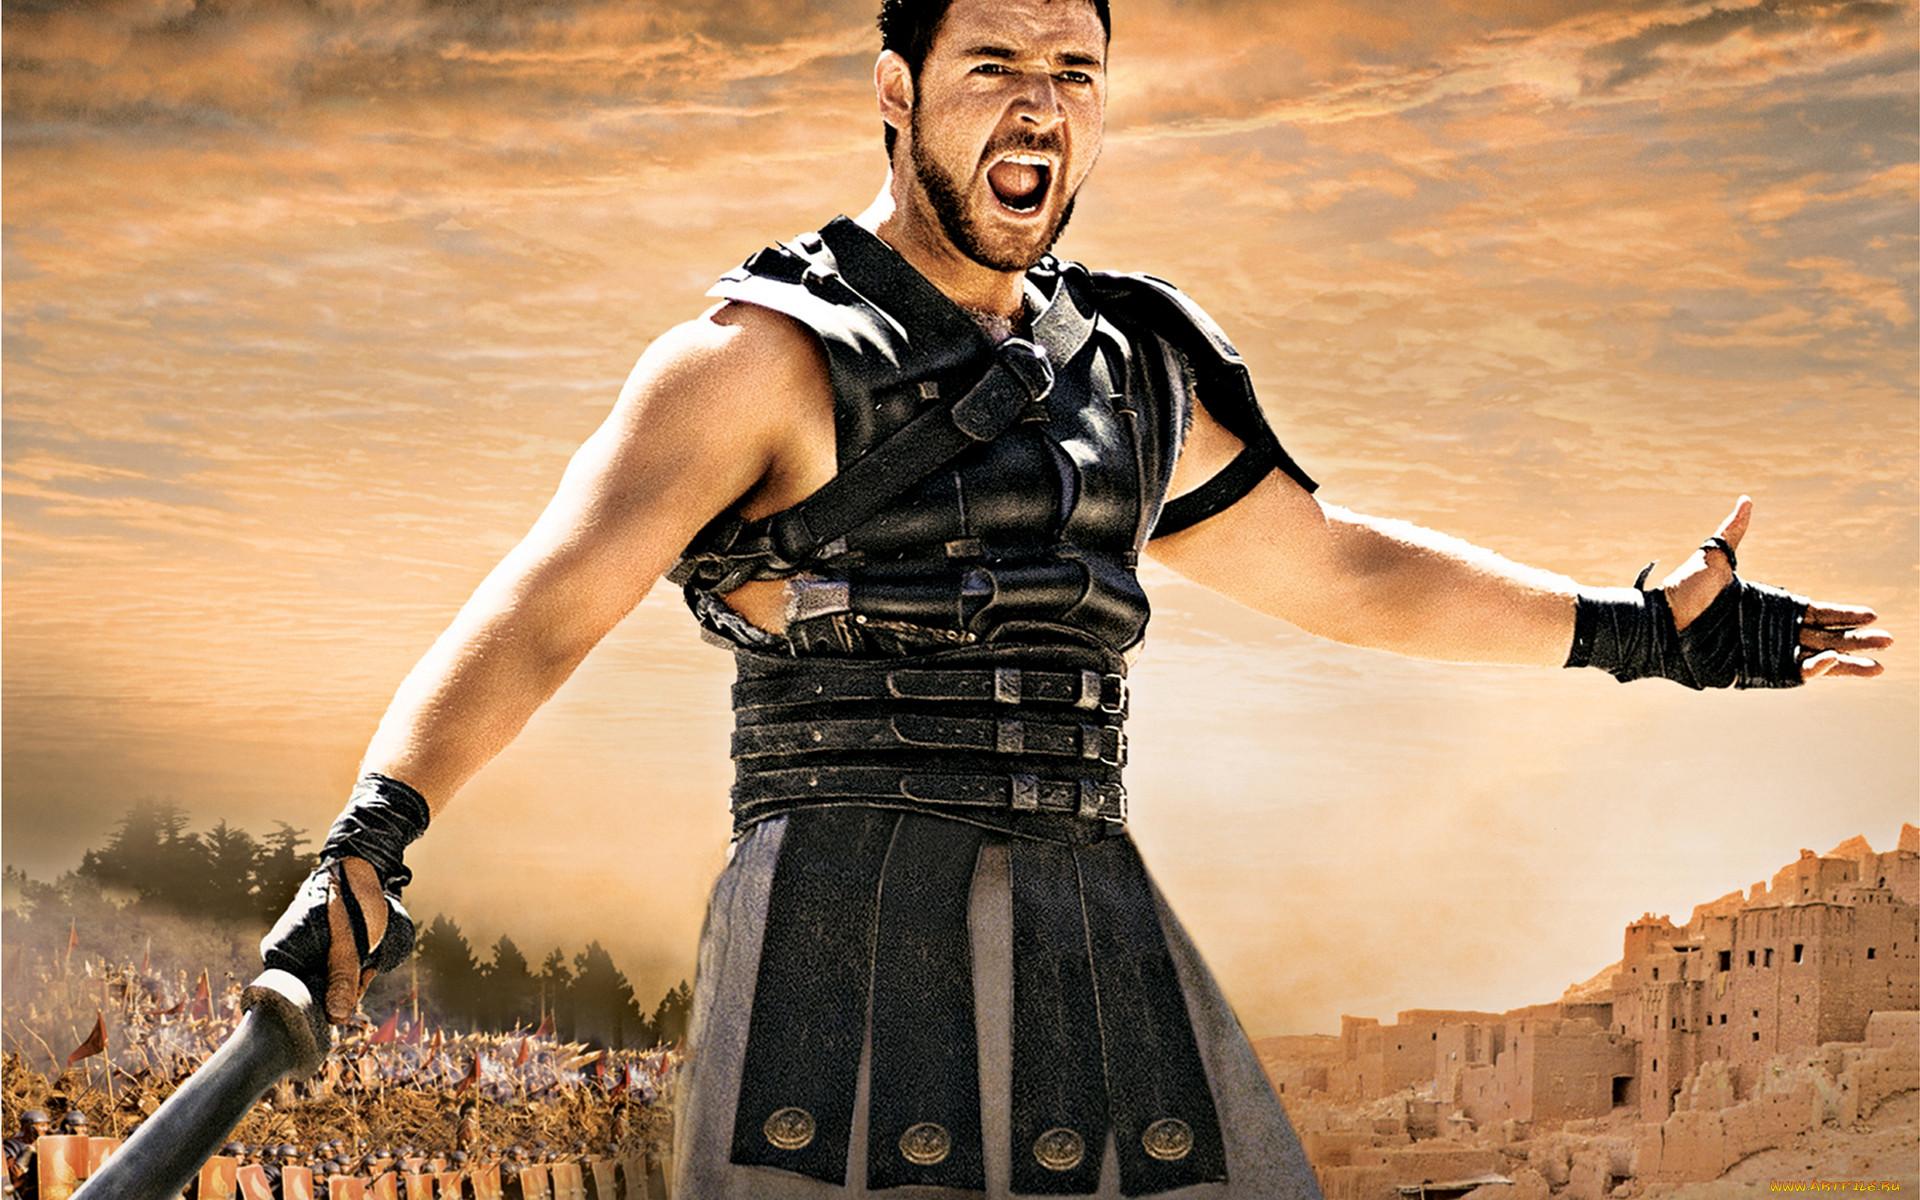 ���������, ����, ������, gladiator, ������, ����, ��������